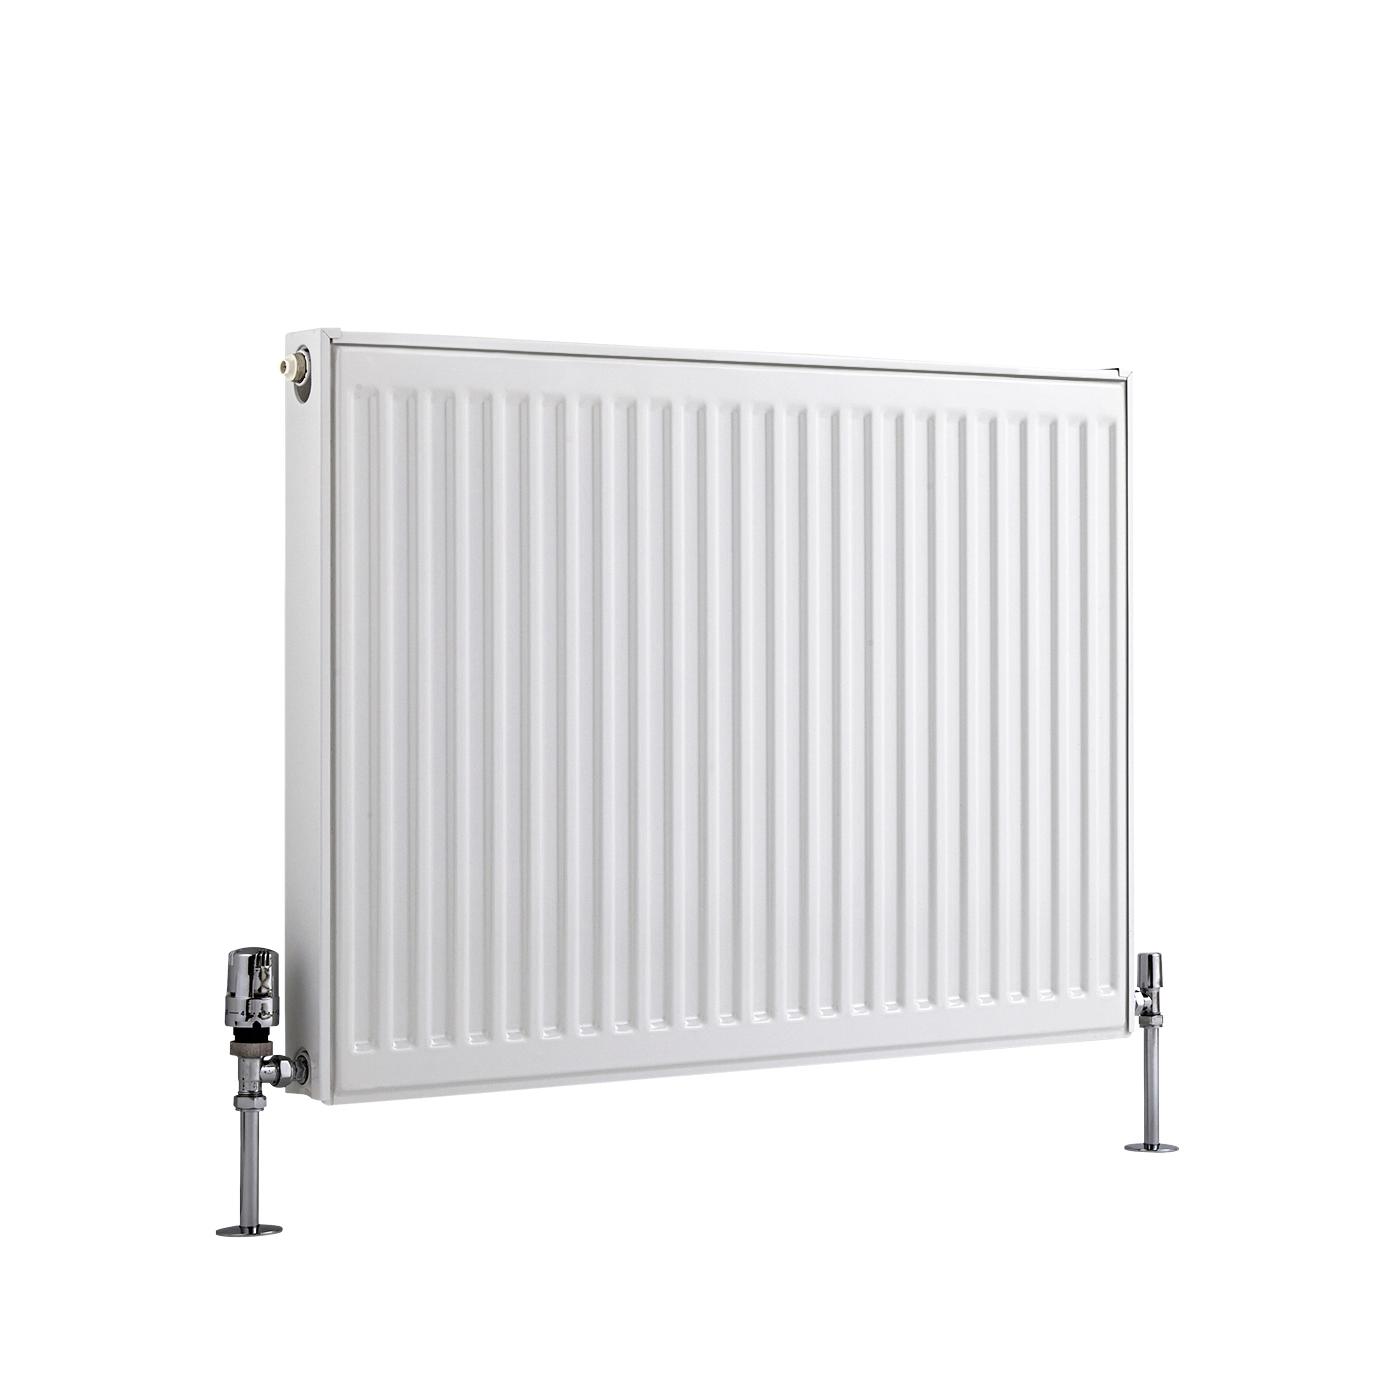 Basic Paneelradiator T 11 Horizontaal Wit 60cm x 80cm x 5cm 741 Watt